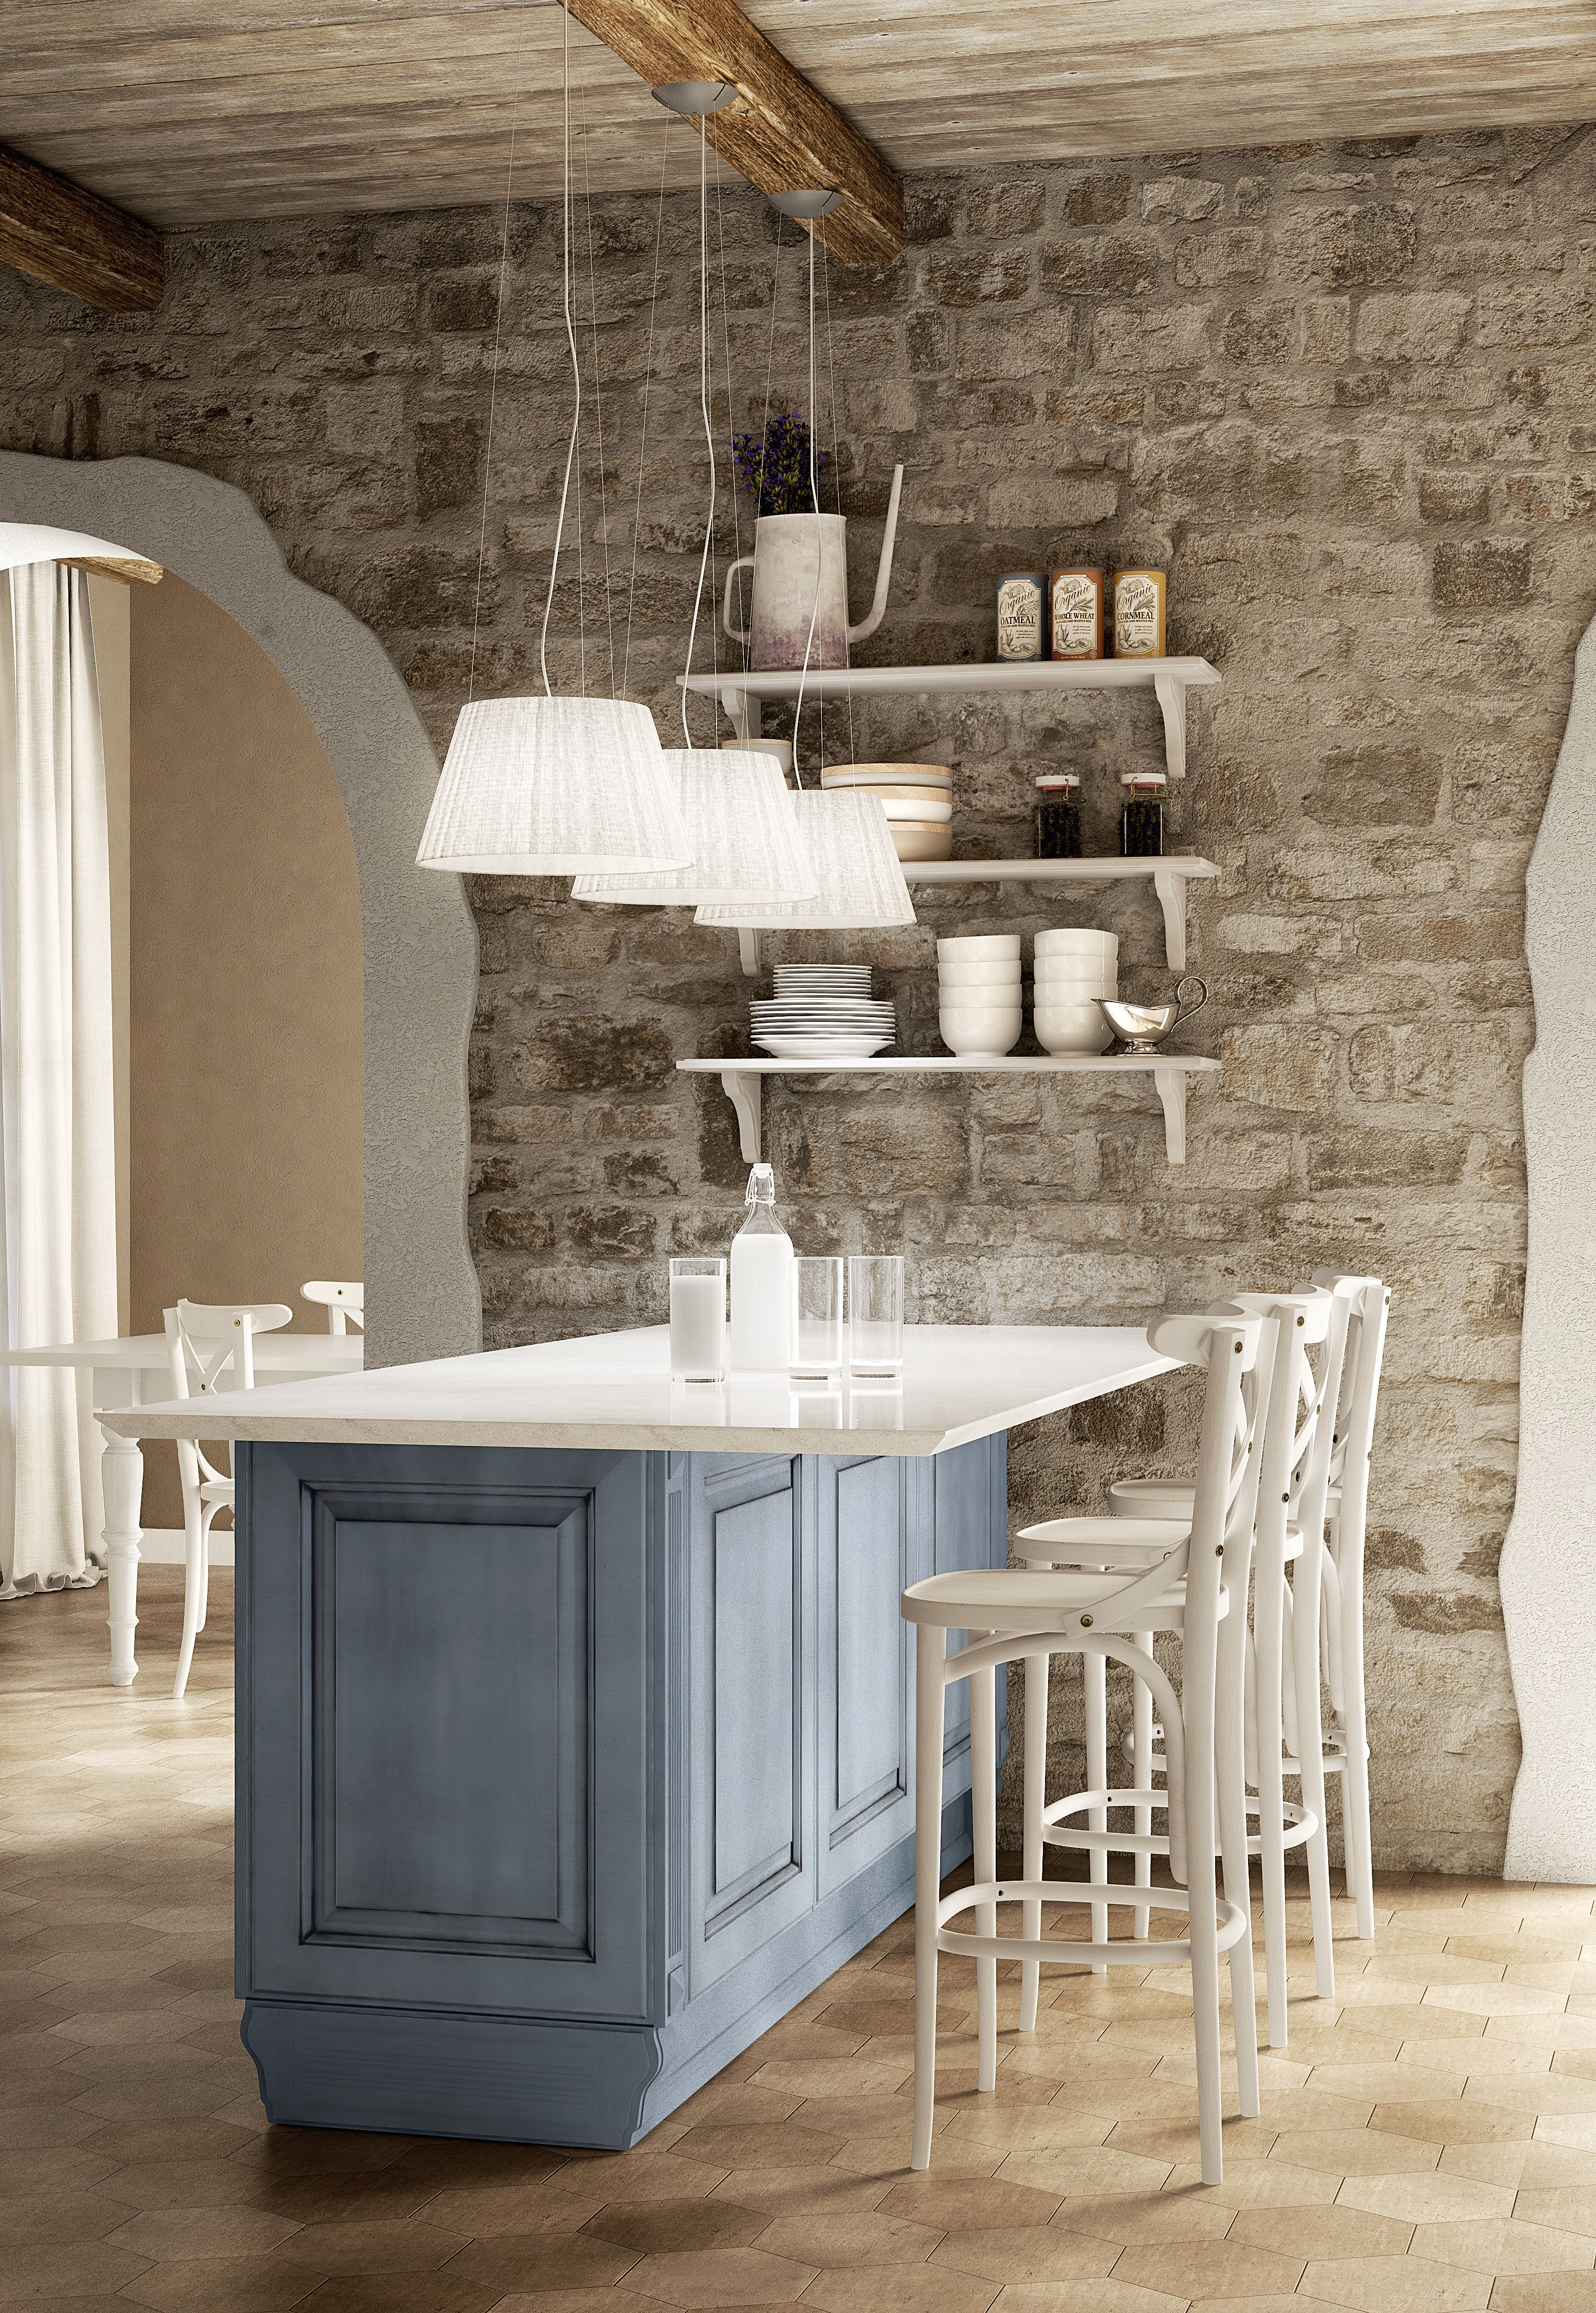 Cucina Berloni Athena | Cucina Berloni Matrix